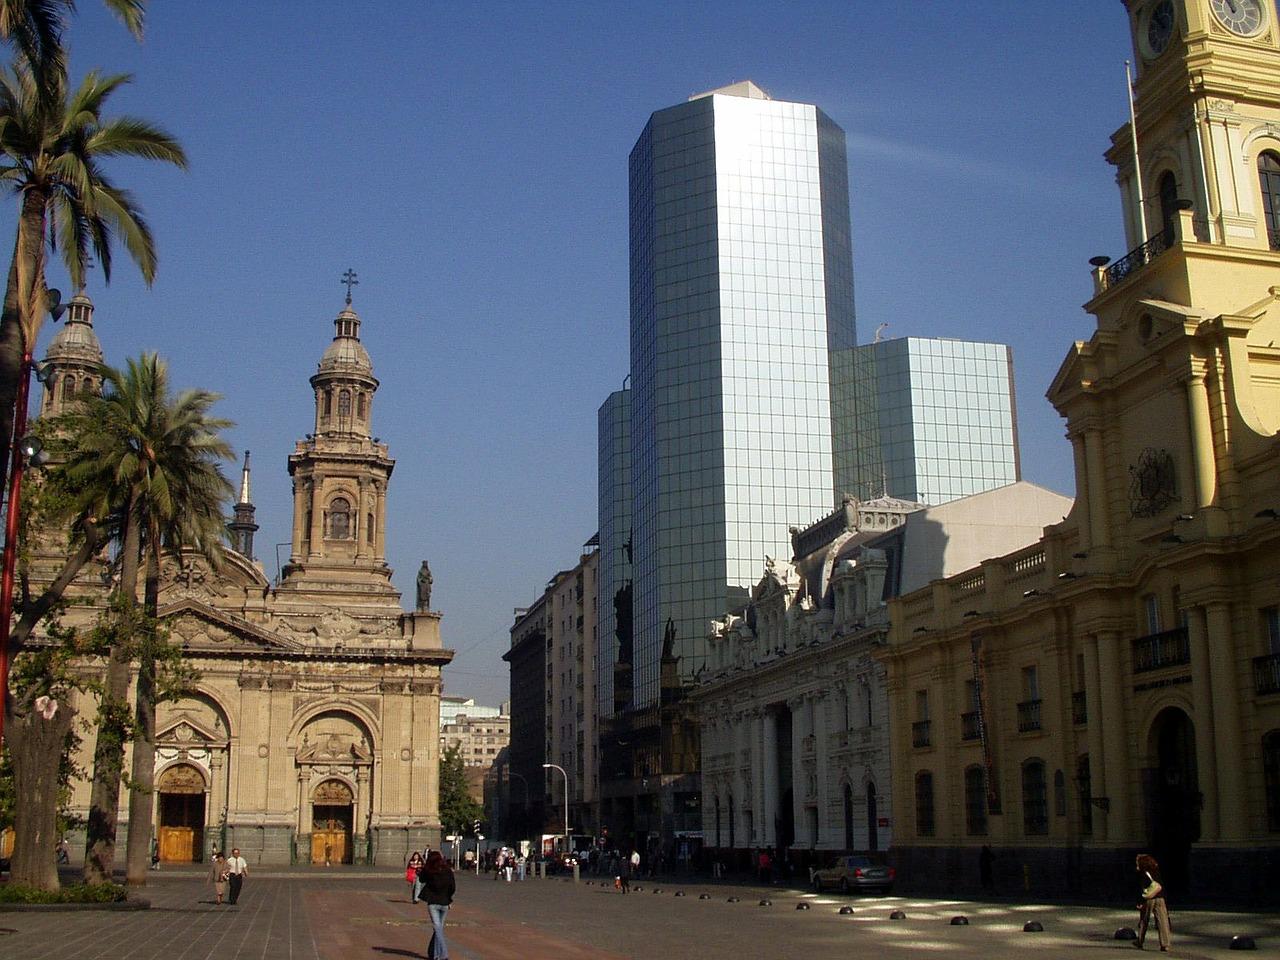 Cattedrale Metropolitana di Santiago